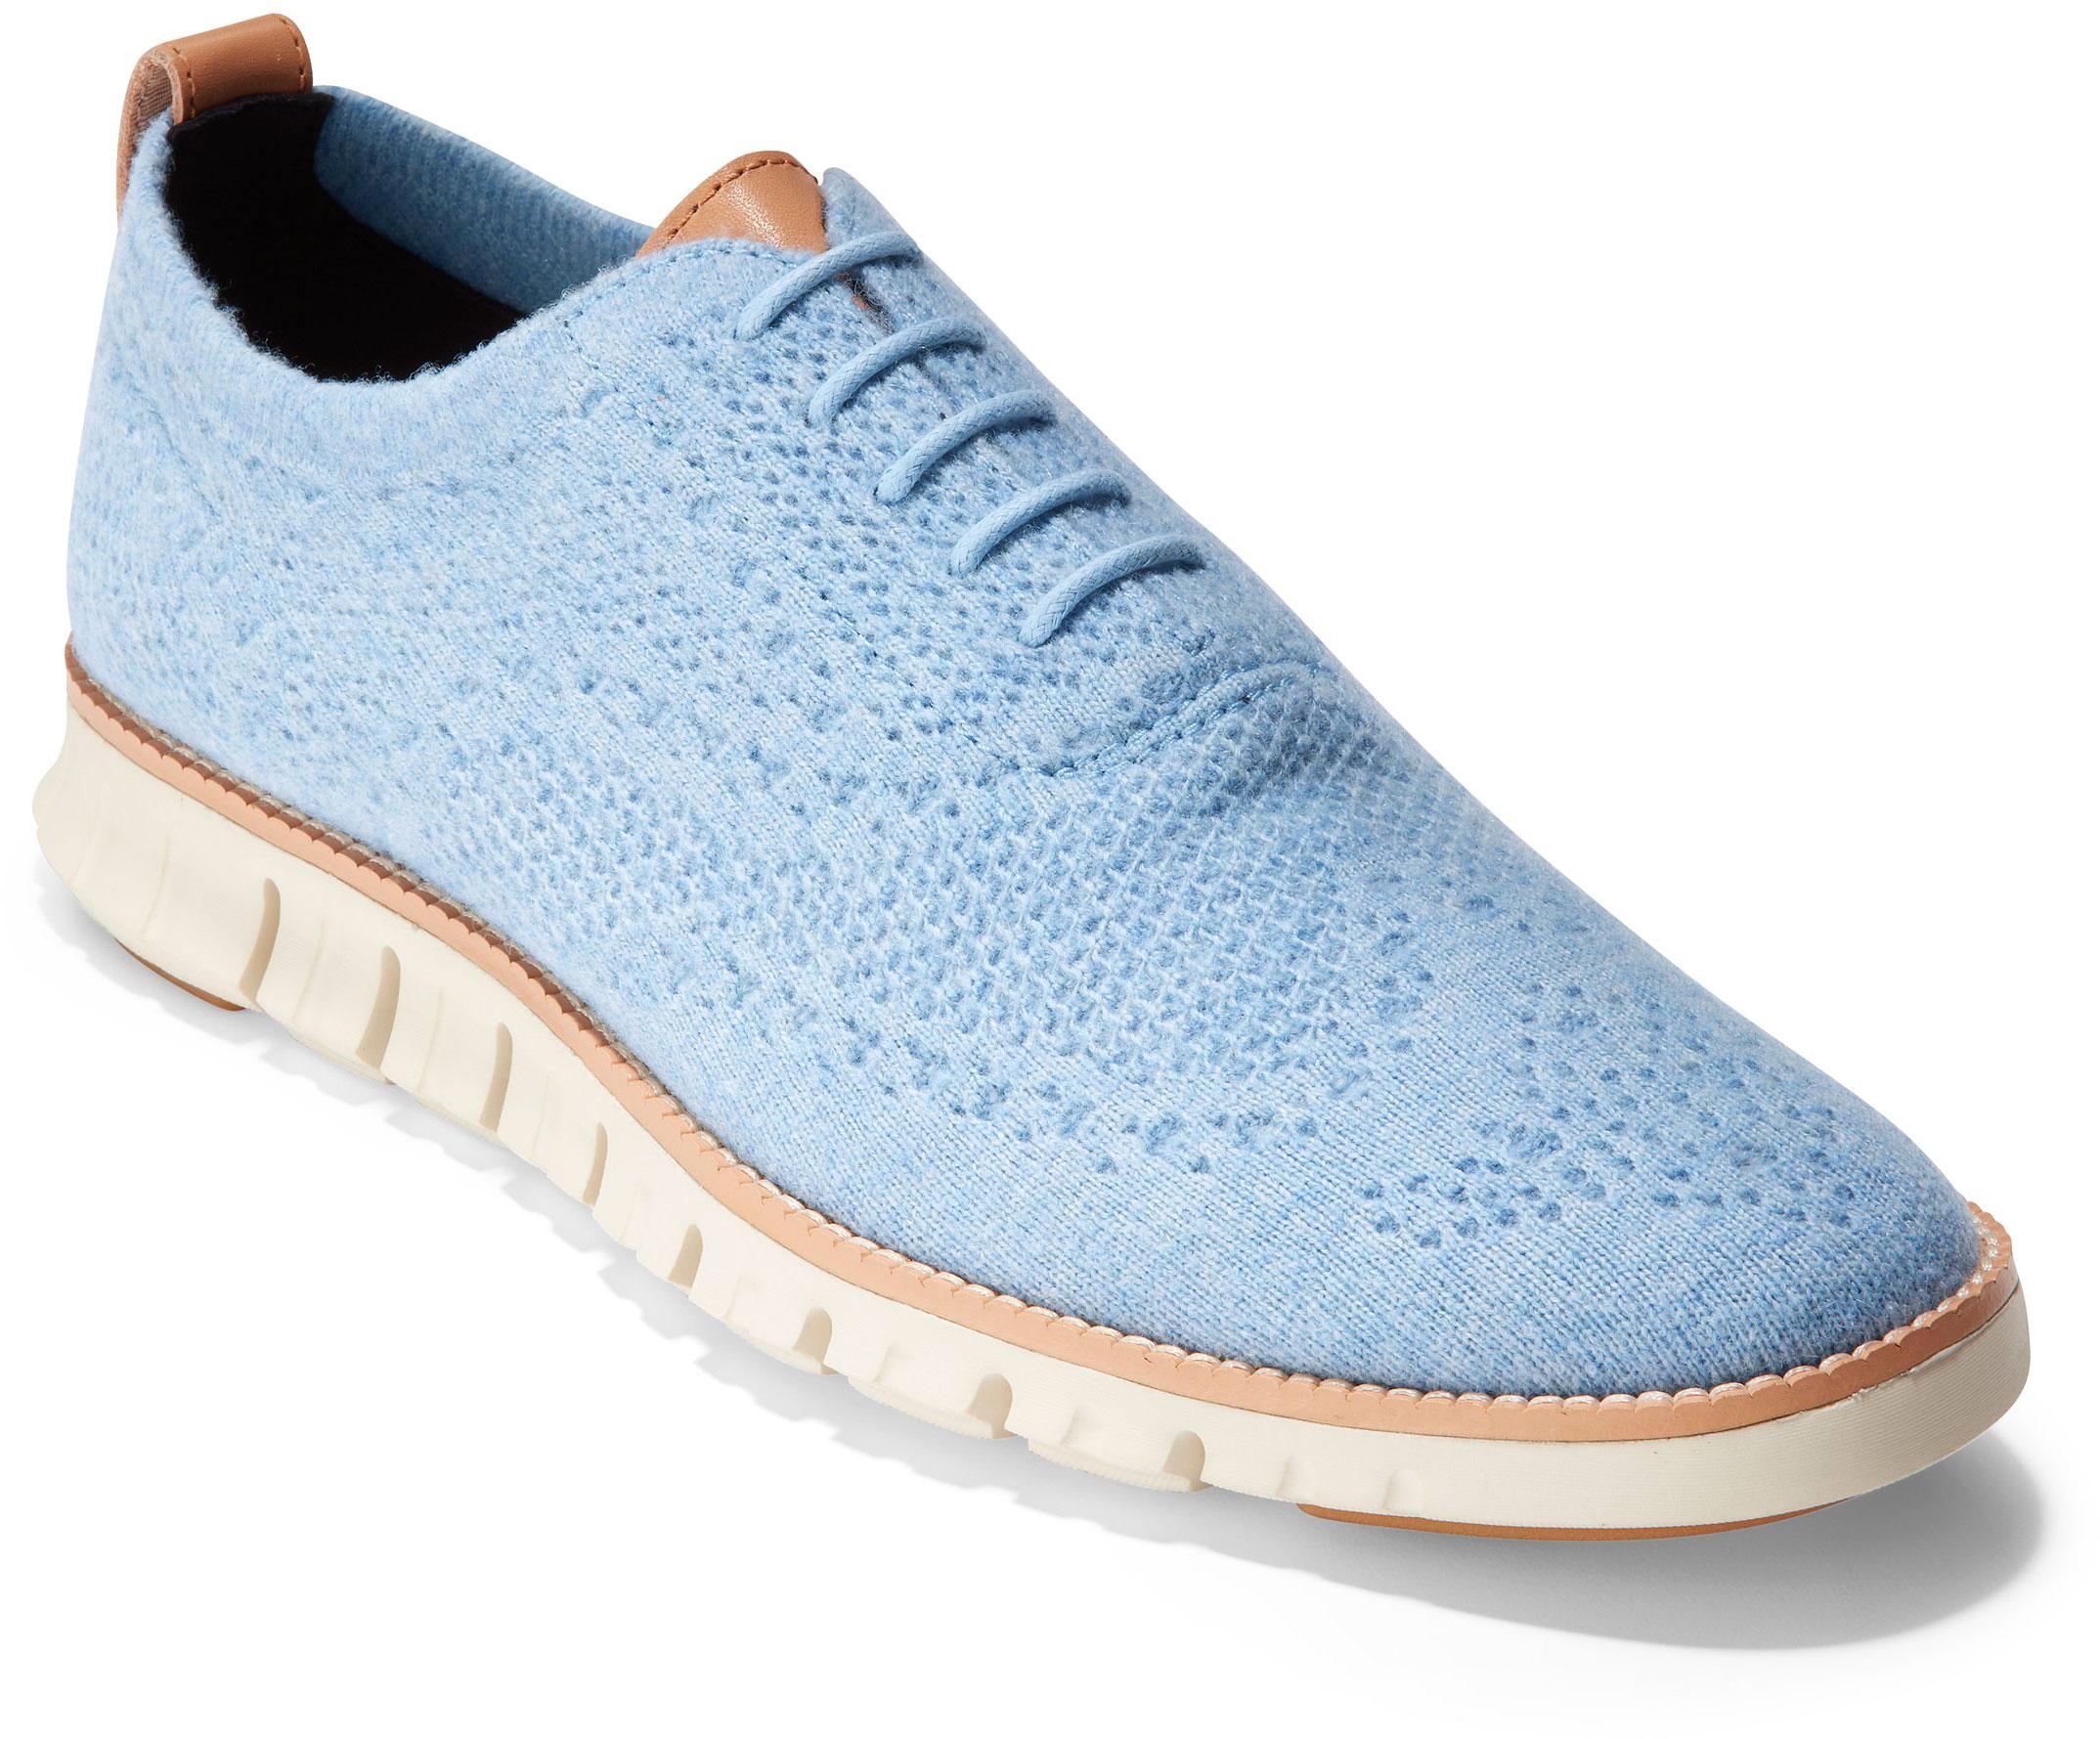 dd0b7a503c Cole Haan Women's Zerogrand Stitchlite Wool Ox C28893 Blue Wool ...